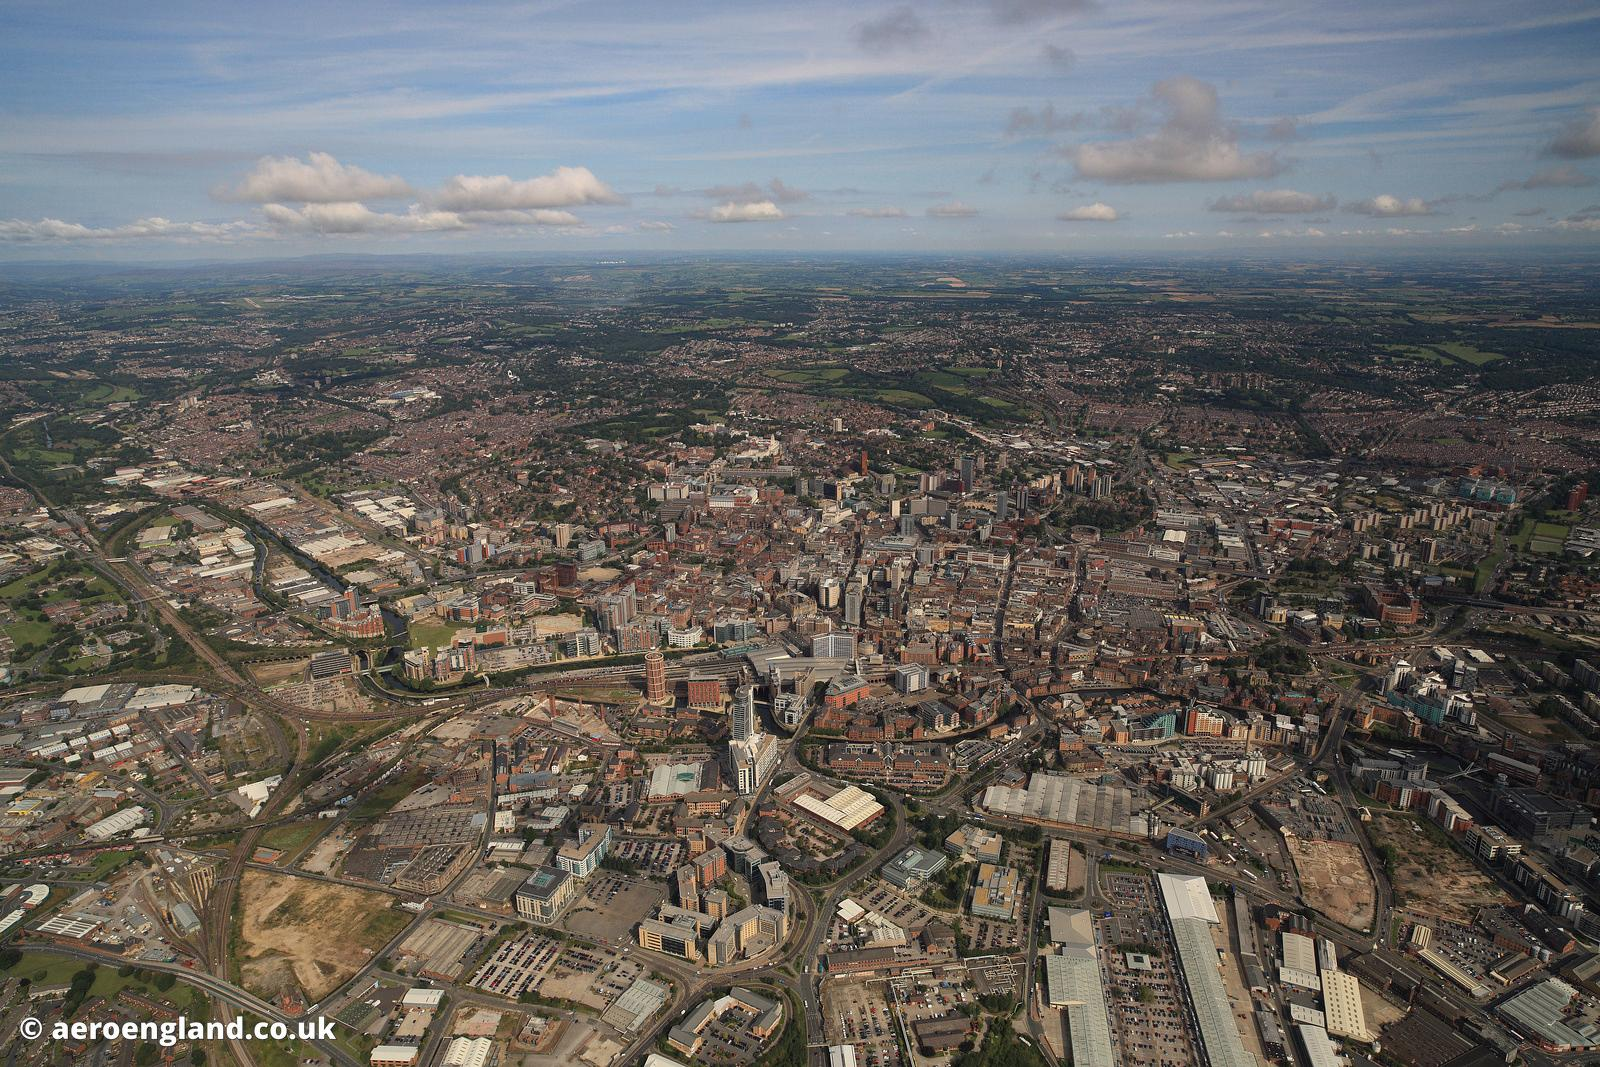 aeroengland   aerial photograph of Leeds Yorkshire England UK